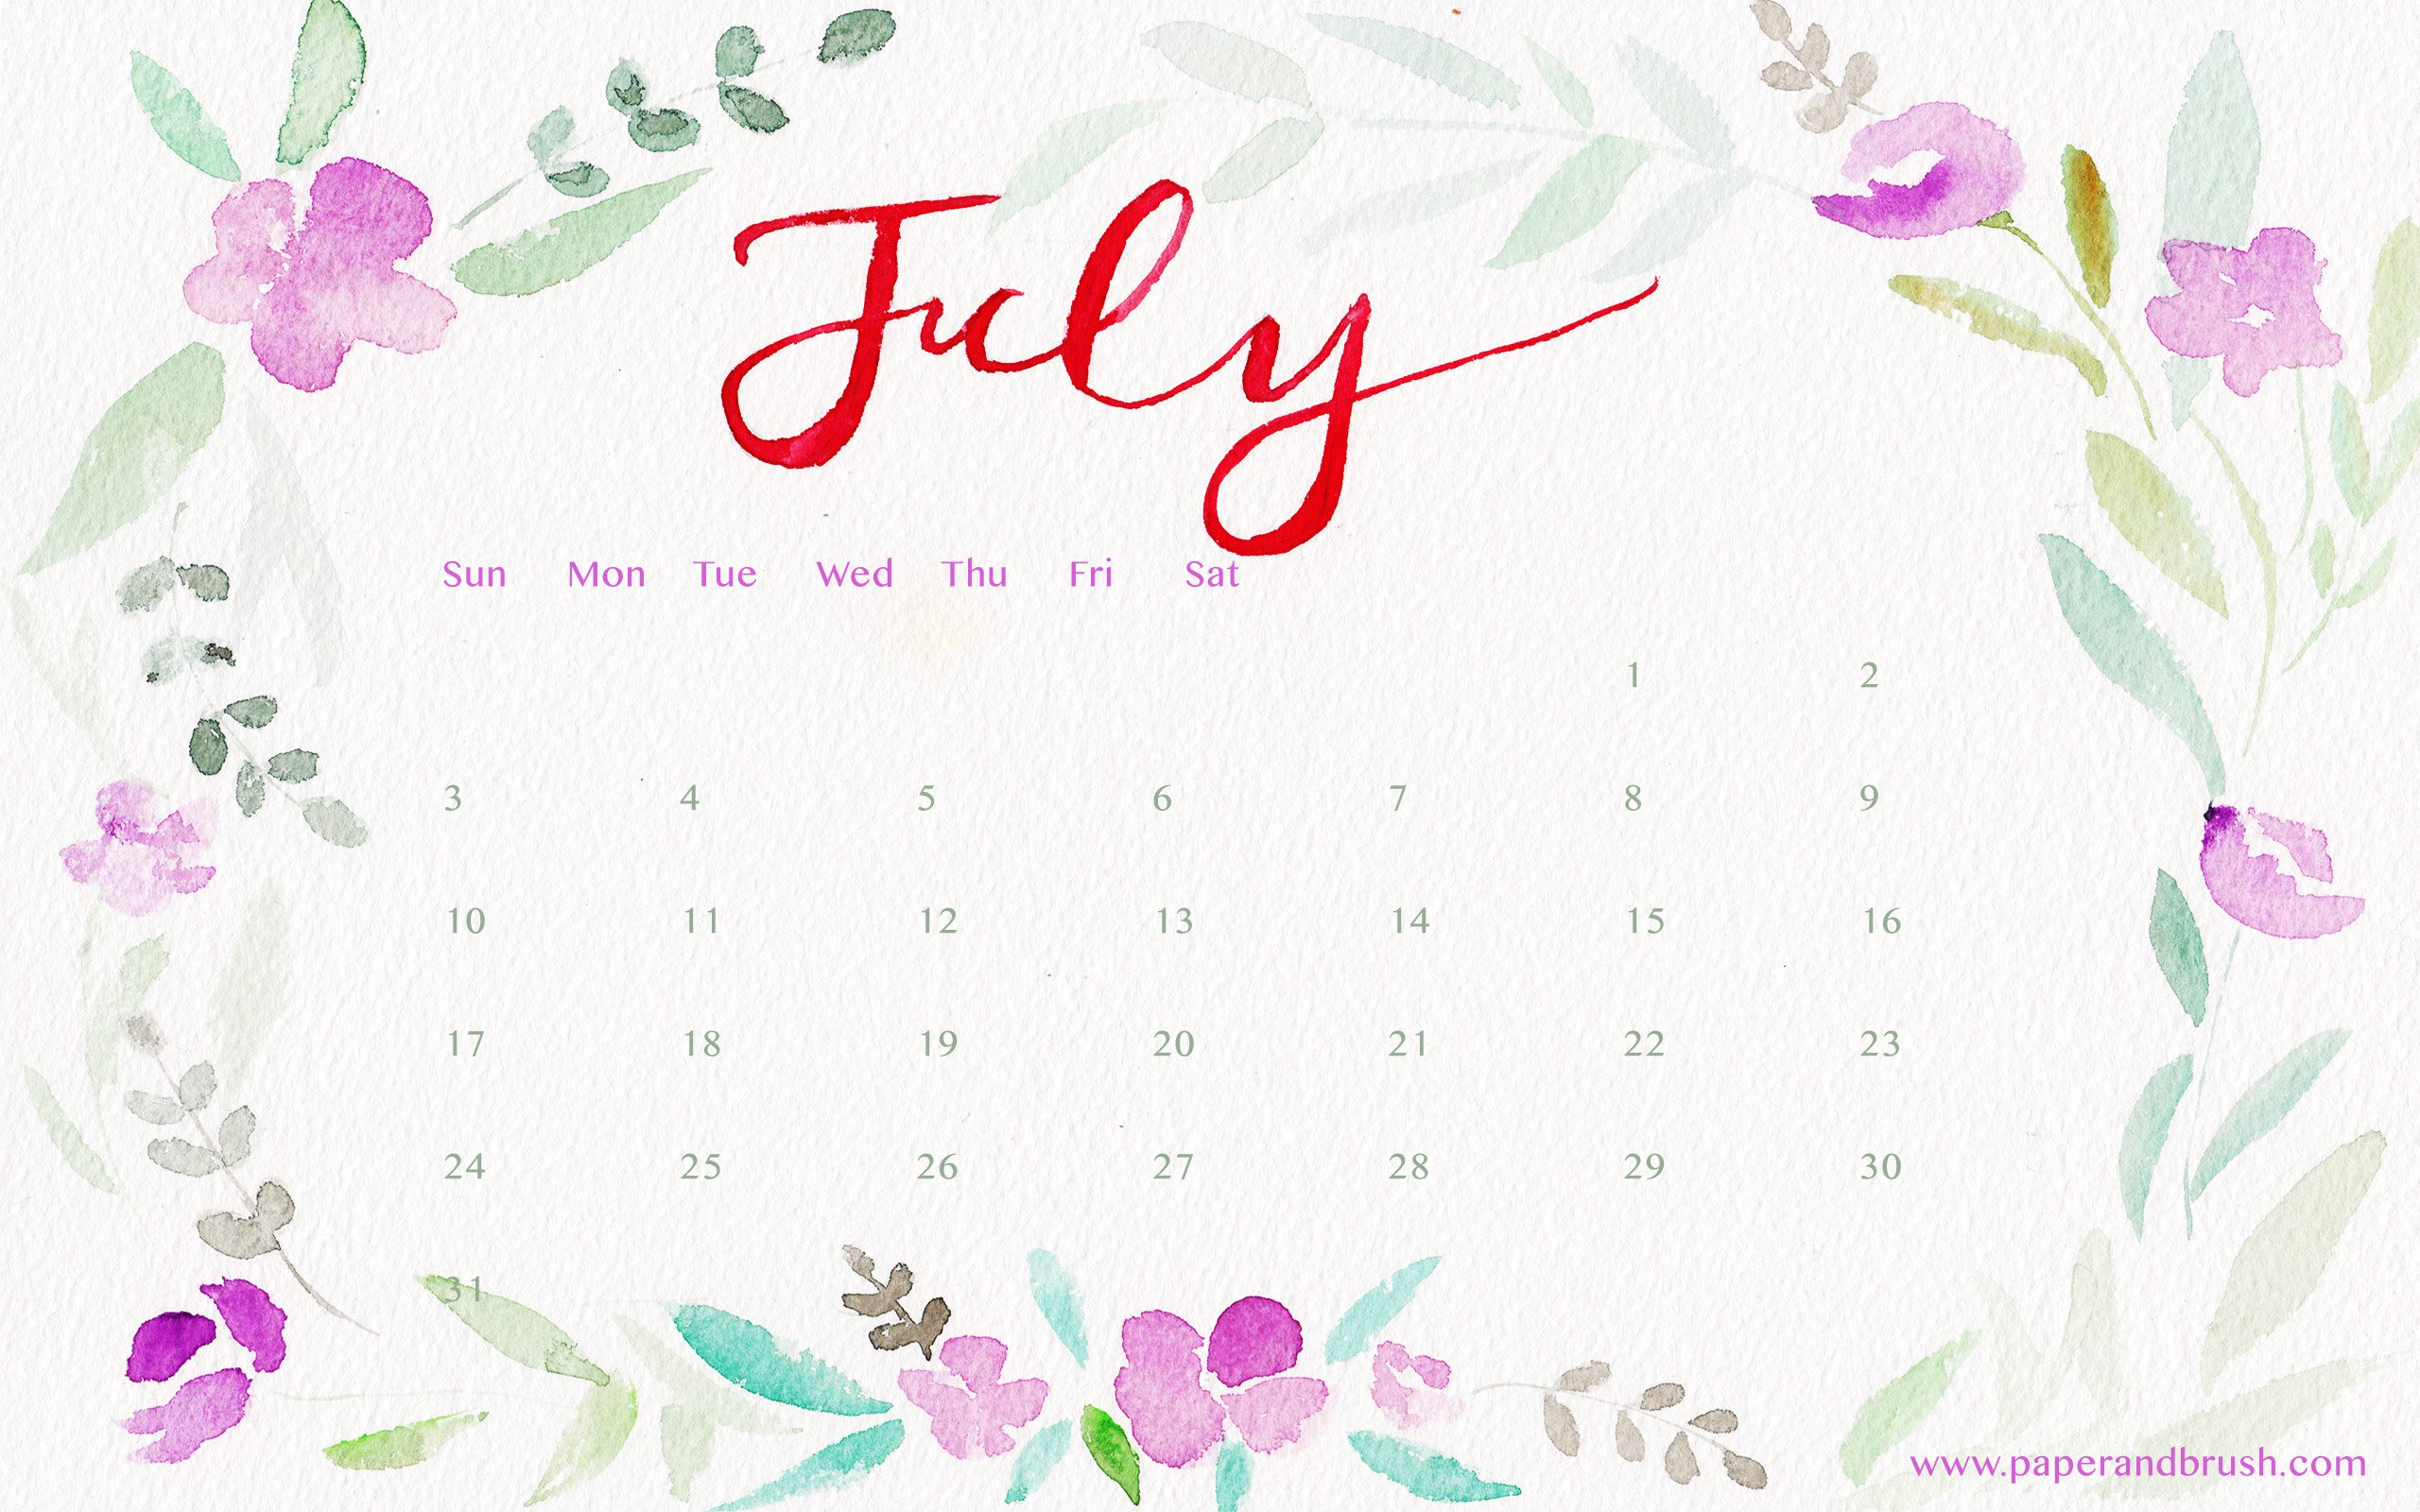 35 Desktop Wallpapers Calendar July 2017 On Wallpapersafari